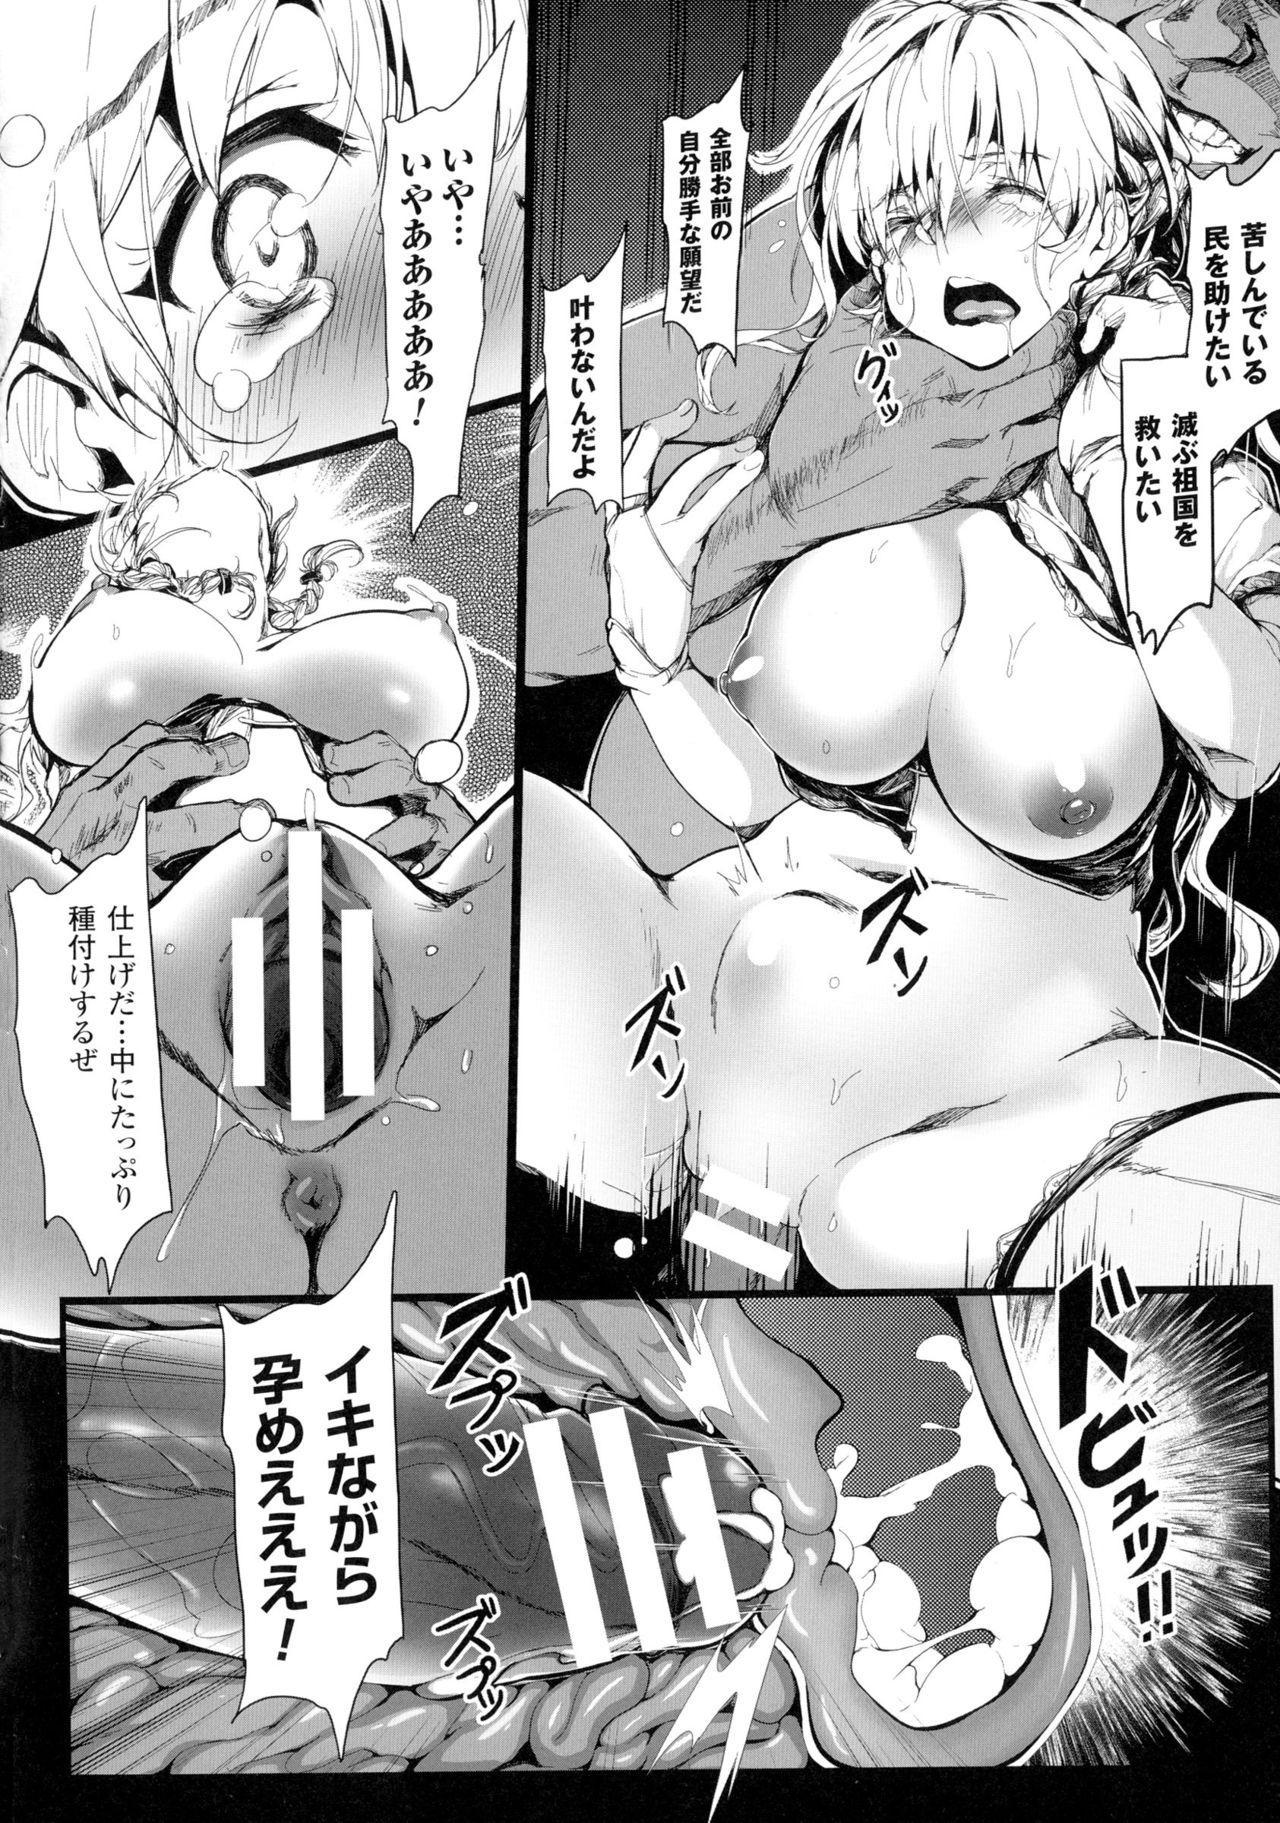 Seigi no Heroine Kangoku File DX Vol. 1 66